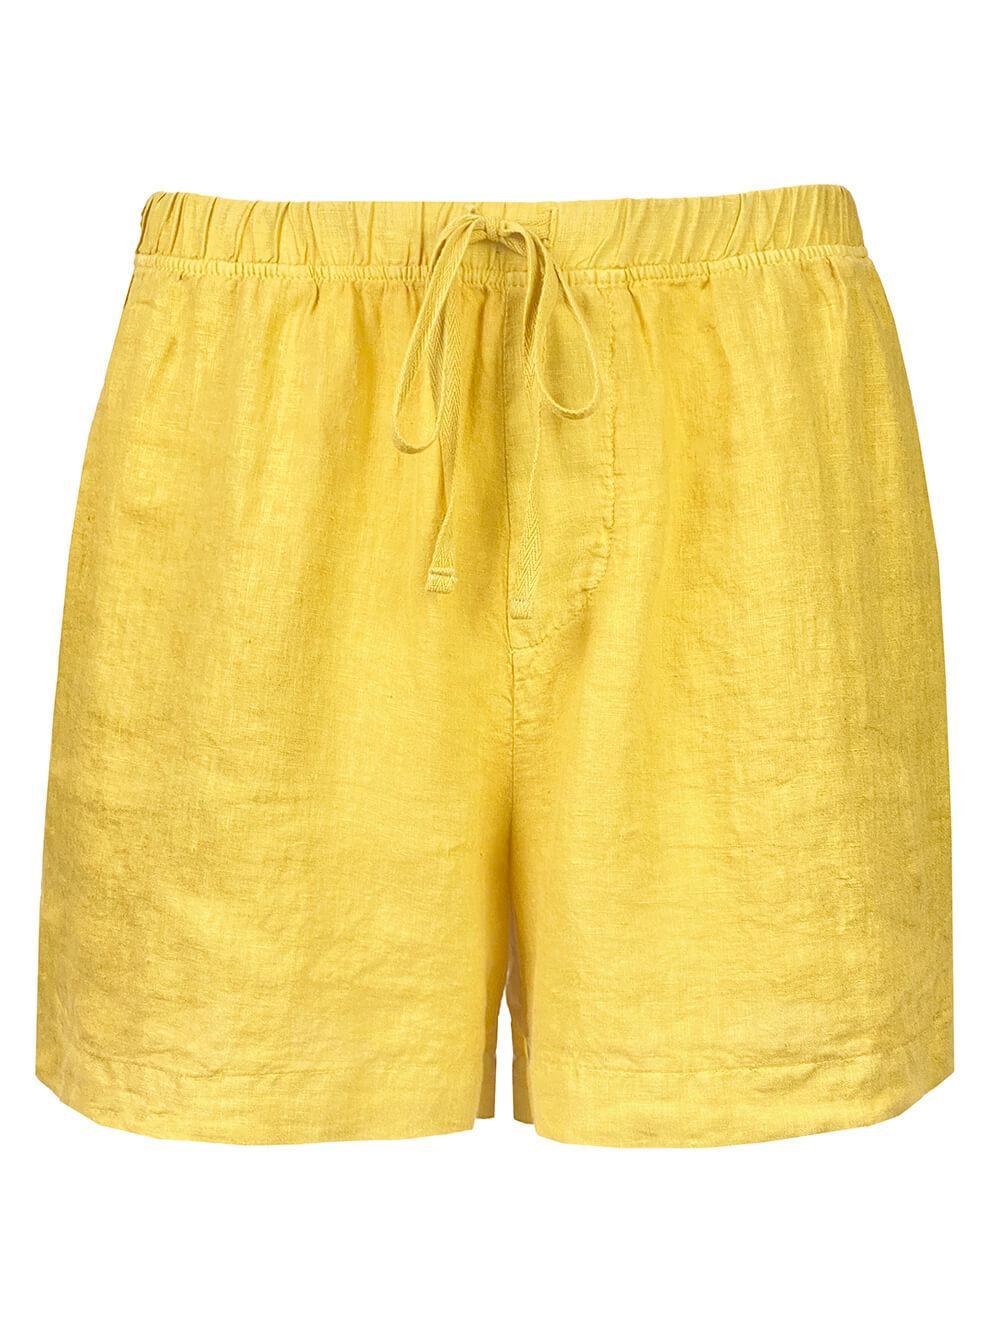 Linen Drawstring Shorts Item # TAMMY04